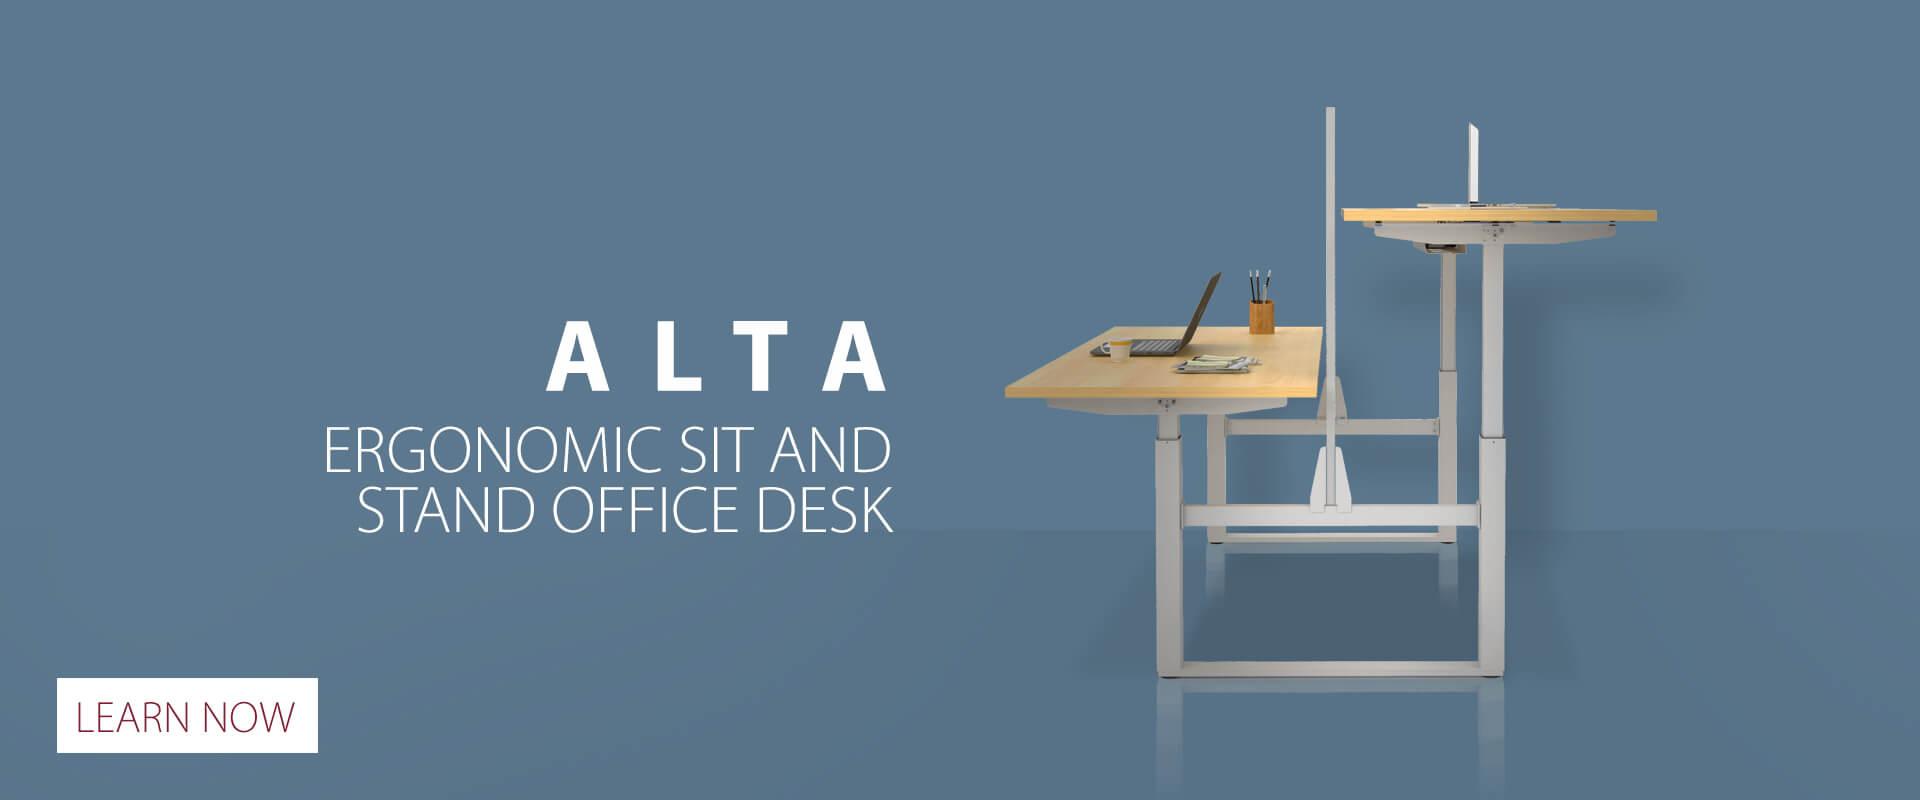 Alta - Ergonomic Sit & Stand Office Desk